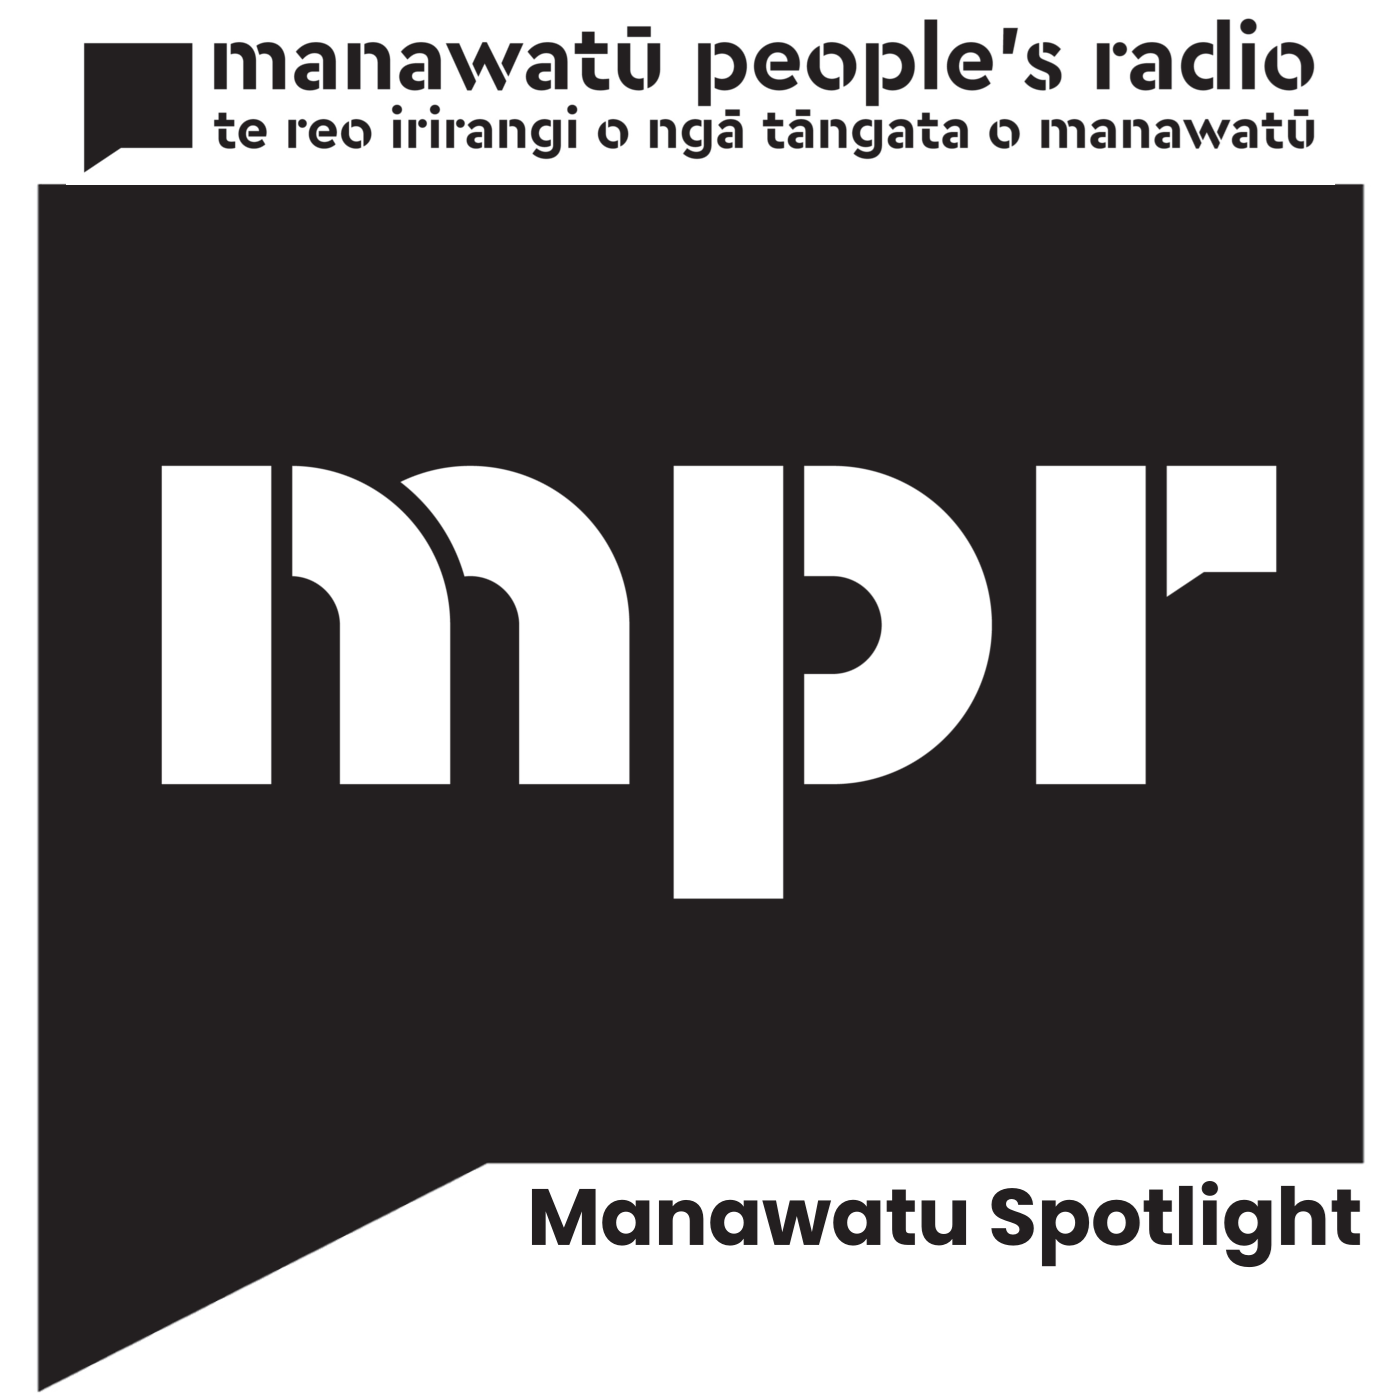 https://static.accessradio.org/StationFolder/manawatu/Images/MPRManawatuSpot.png